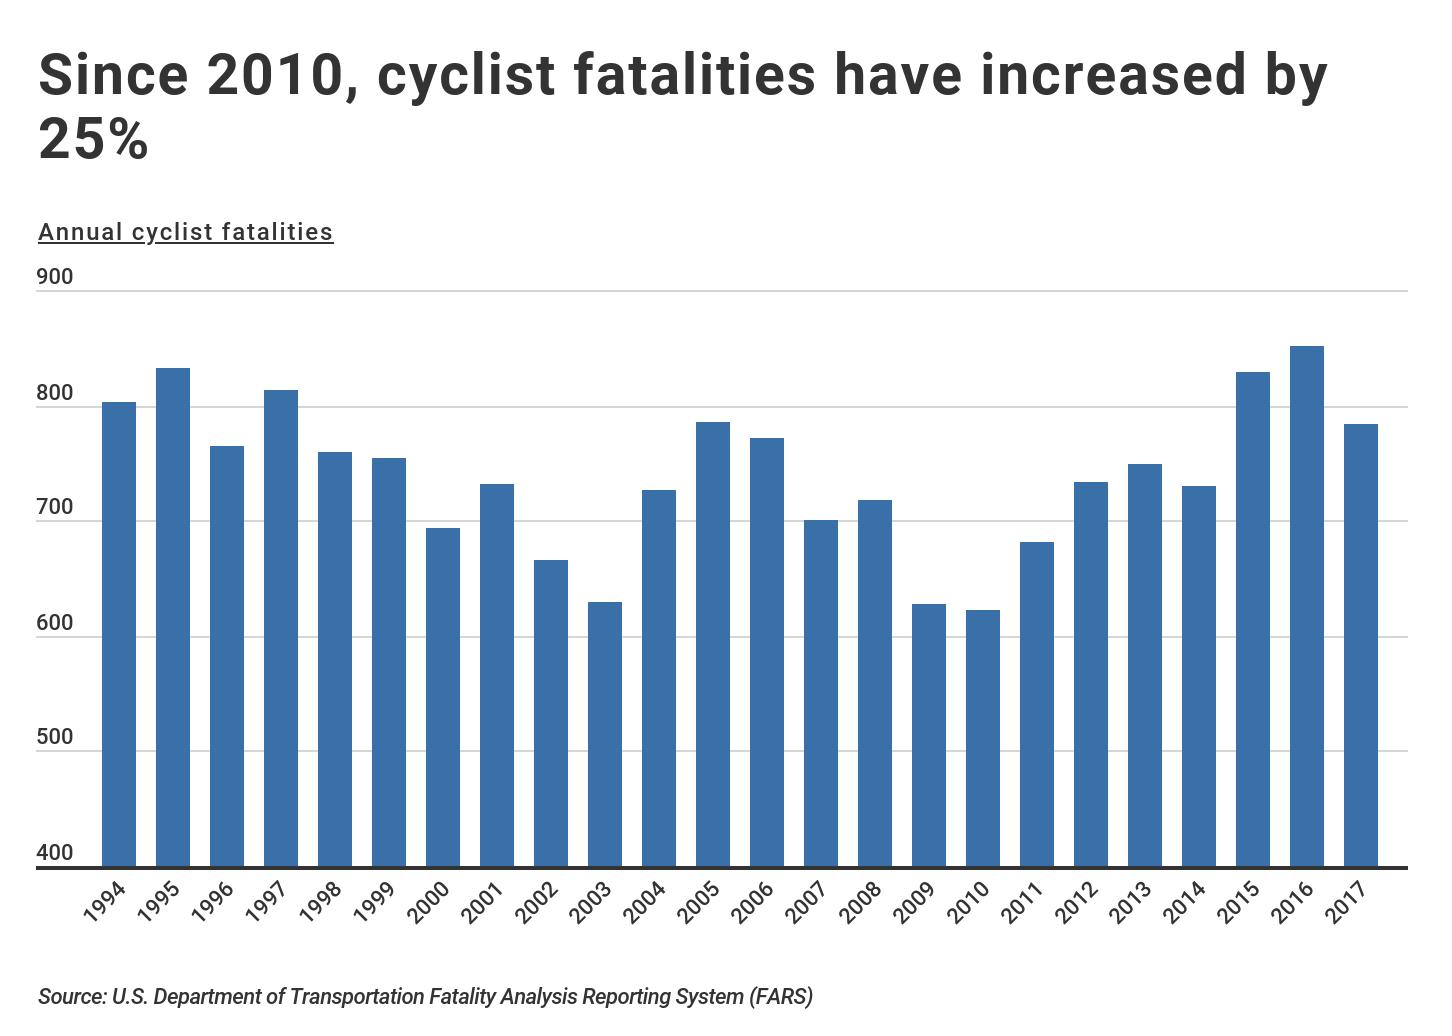 Cyclist fatalities increasing since 2010